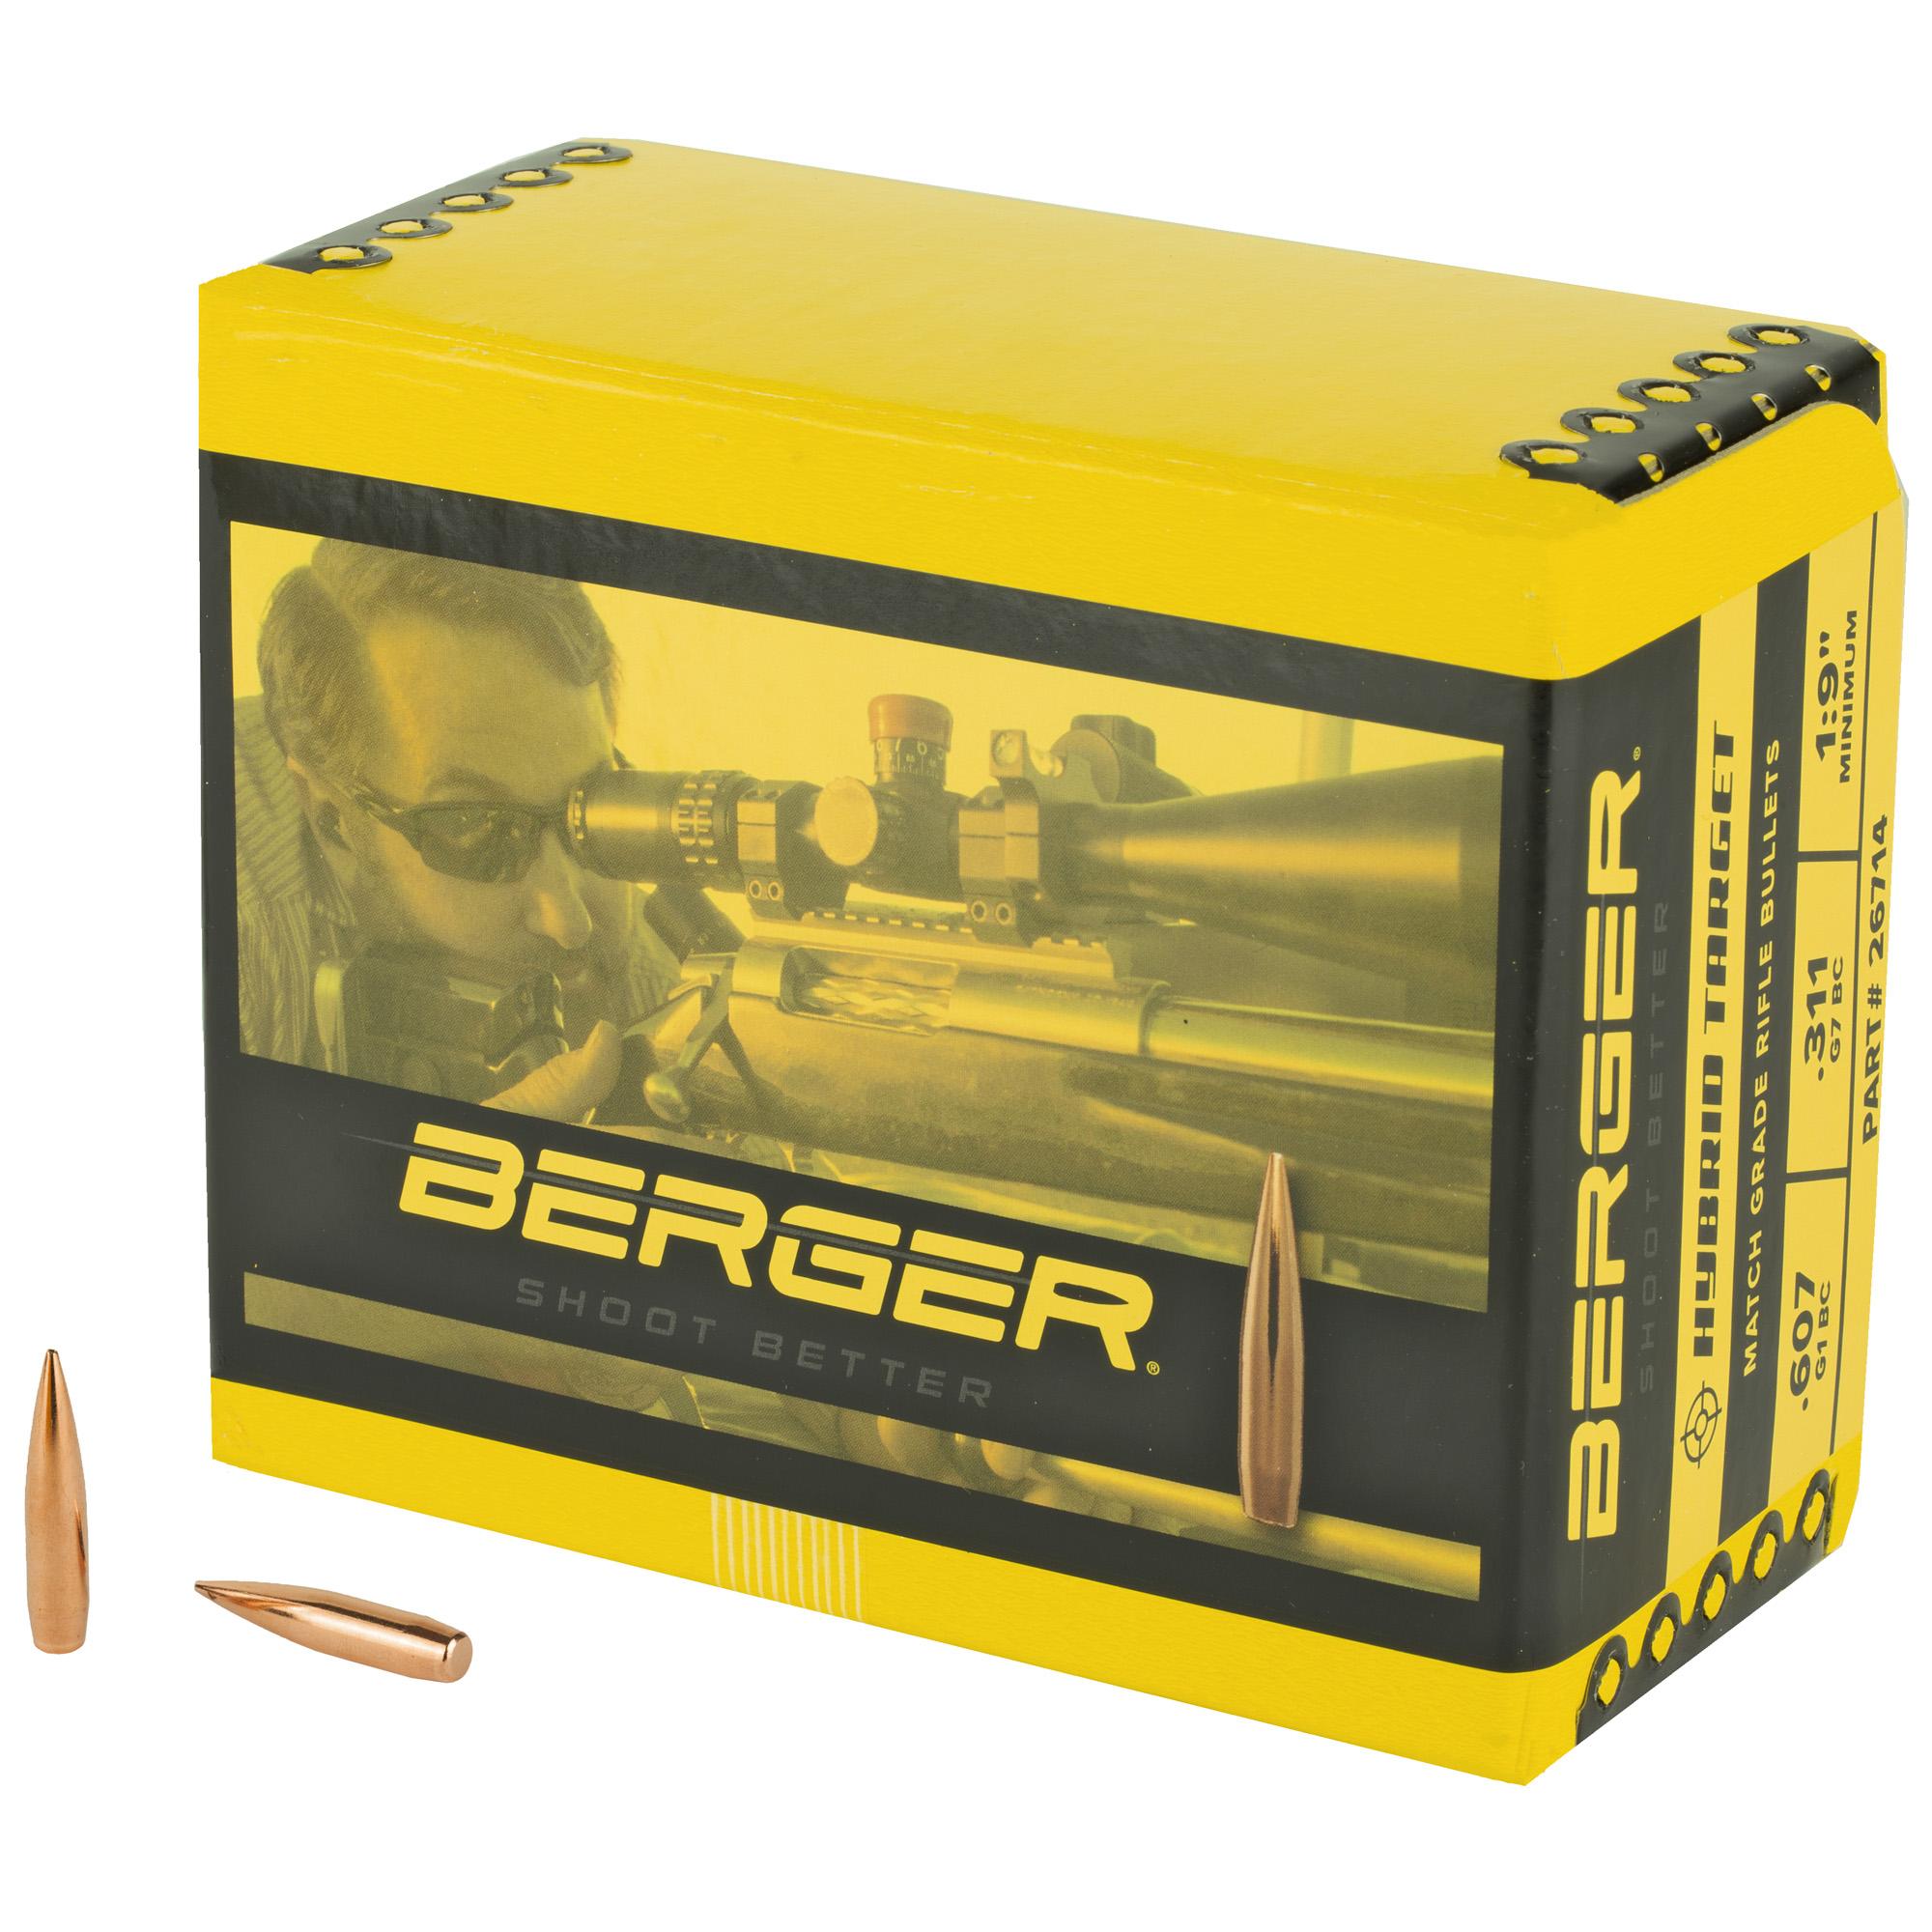 Berger 6.5mm 140g Hybrid Targt 500ct